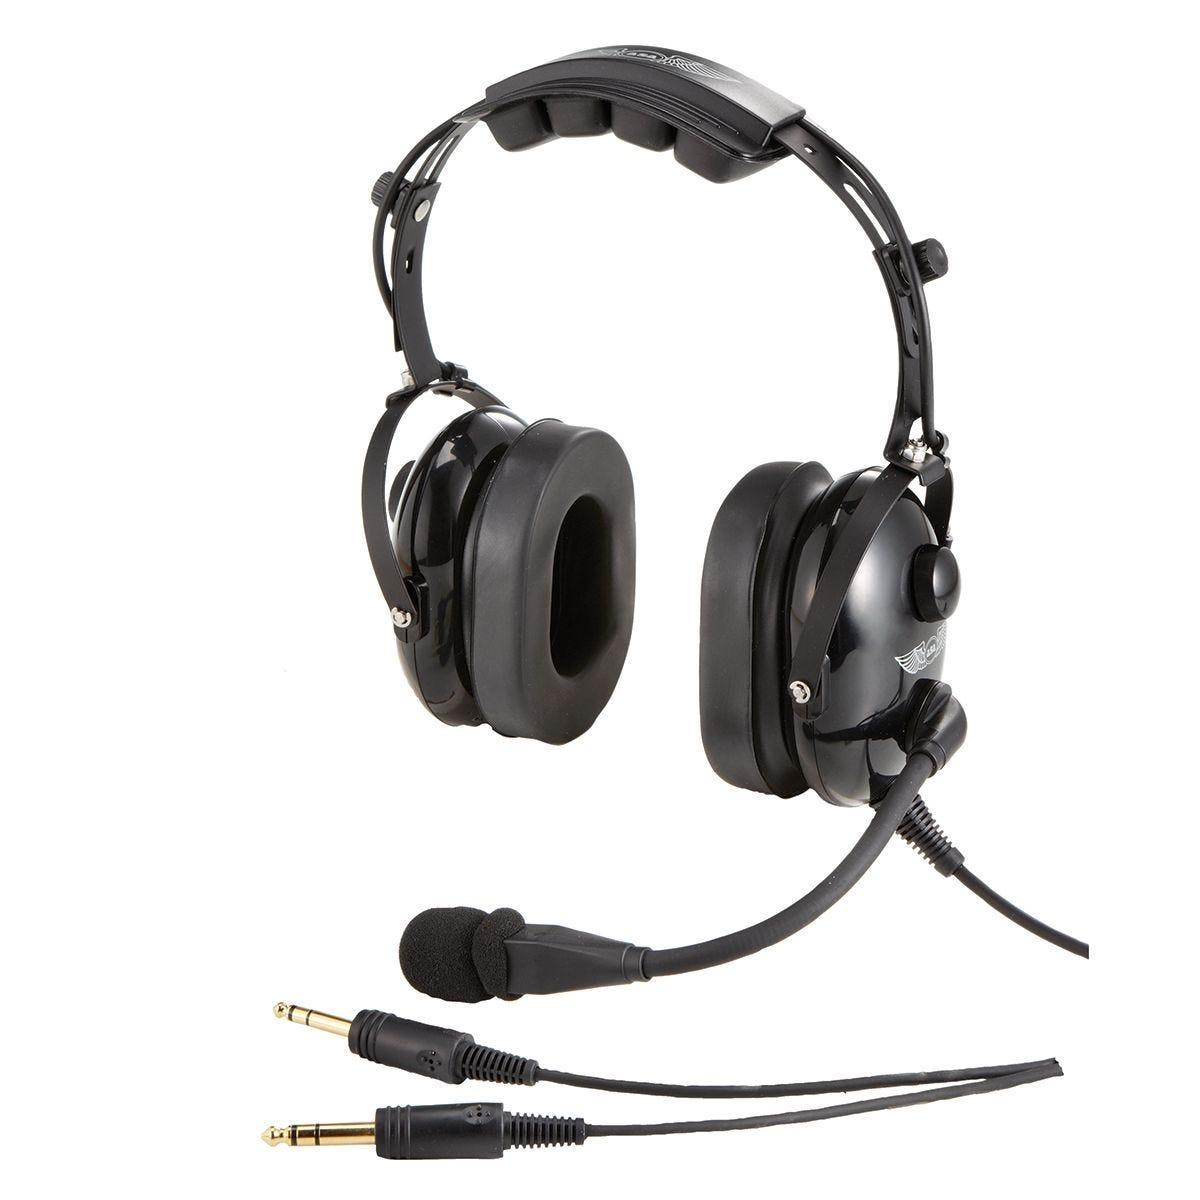 ASA HS-1A Headset for pilots